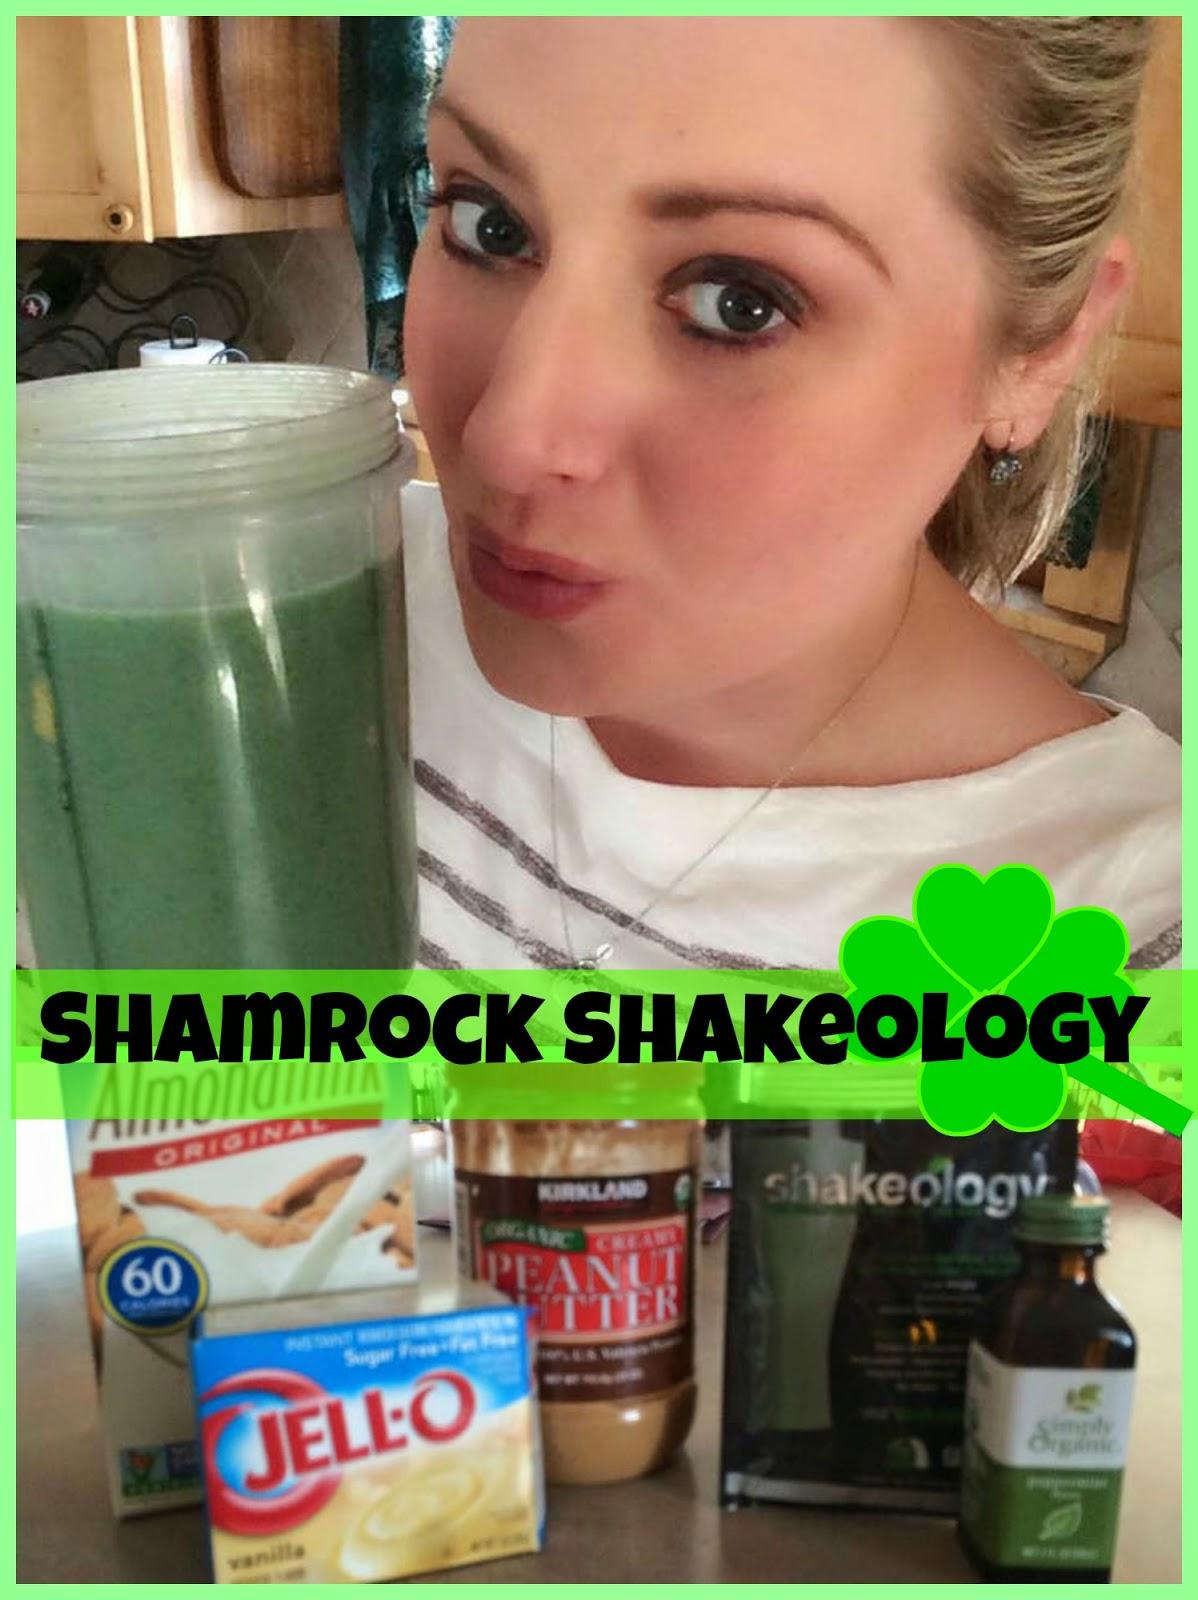 Shamrock Shake, Shakeology, Sara Stakeley, Sarastakeley.com, McDonald's shamrock shake, $4 a day shake,